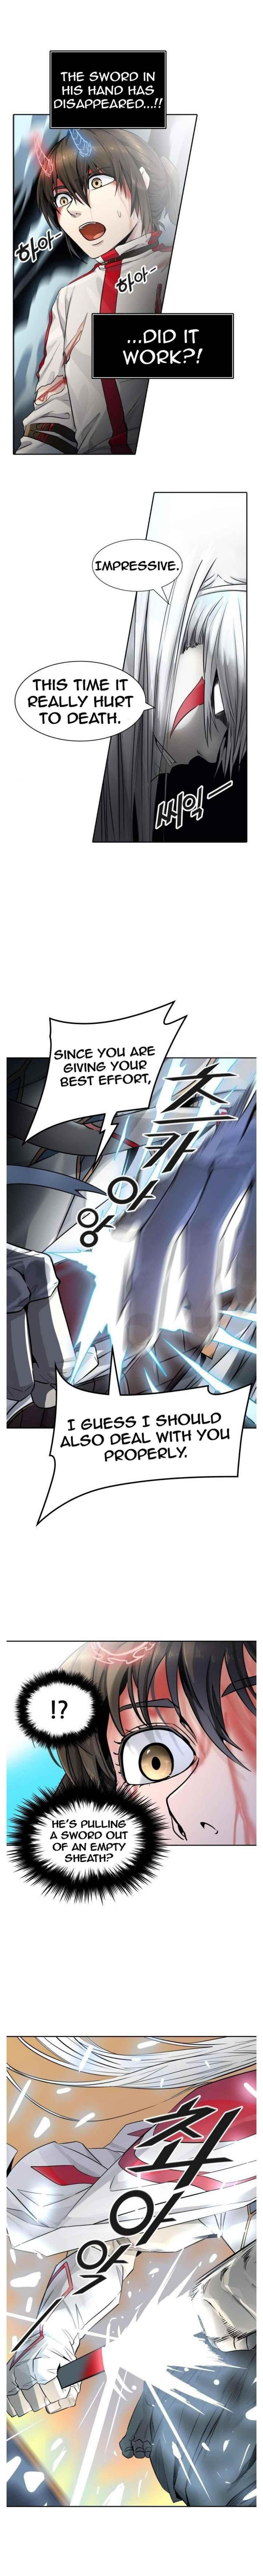 Tower Of God Chapter 506 page 2 - Mangakakalot